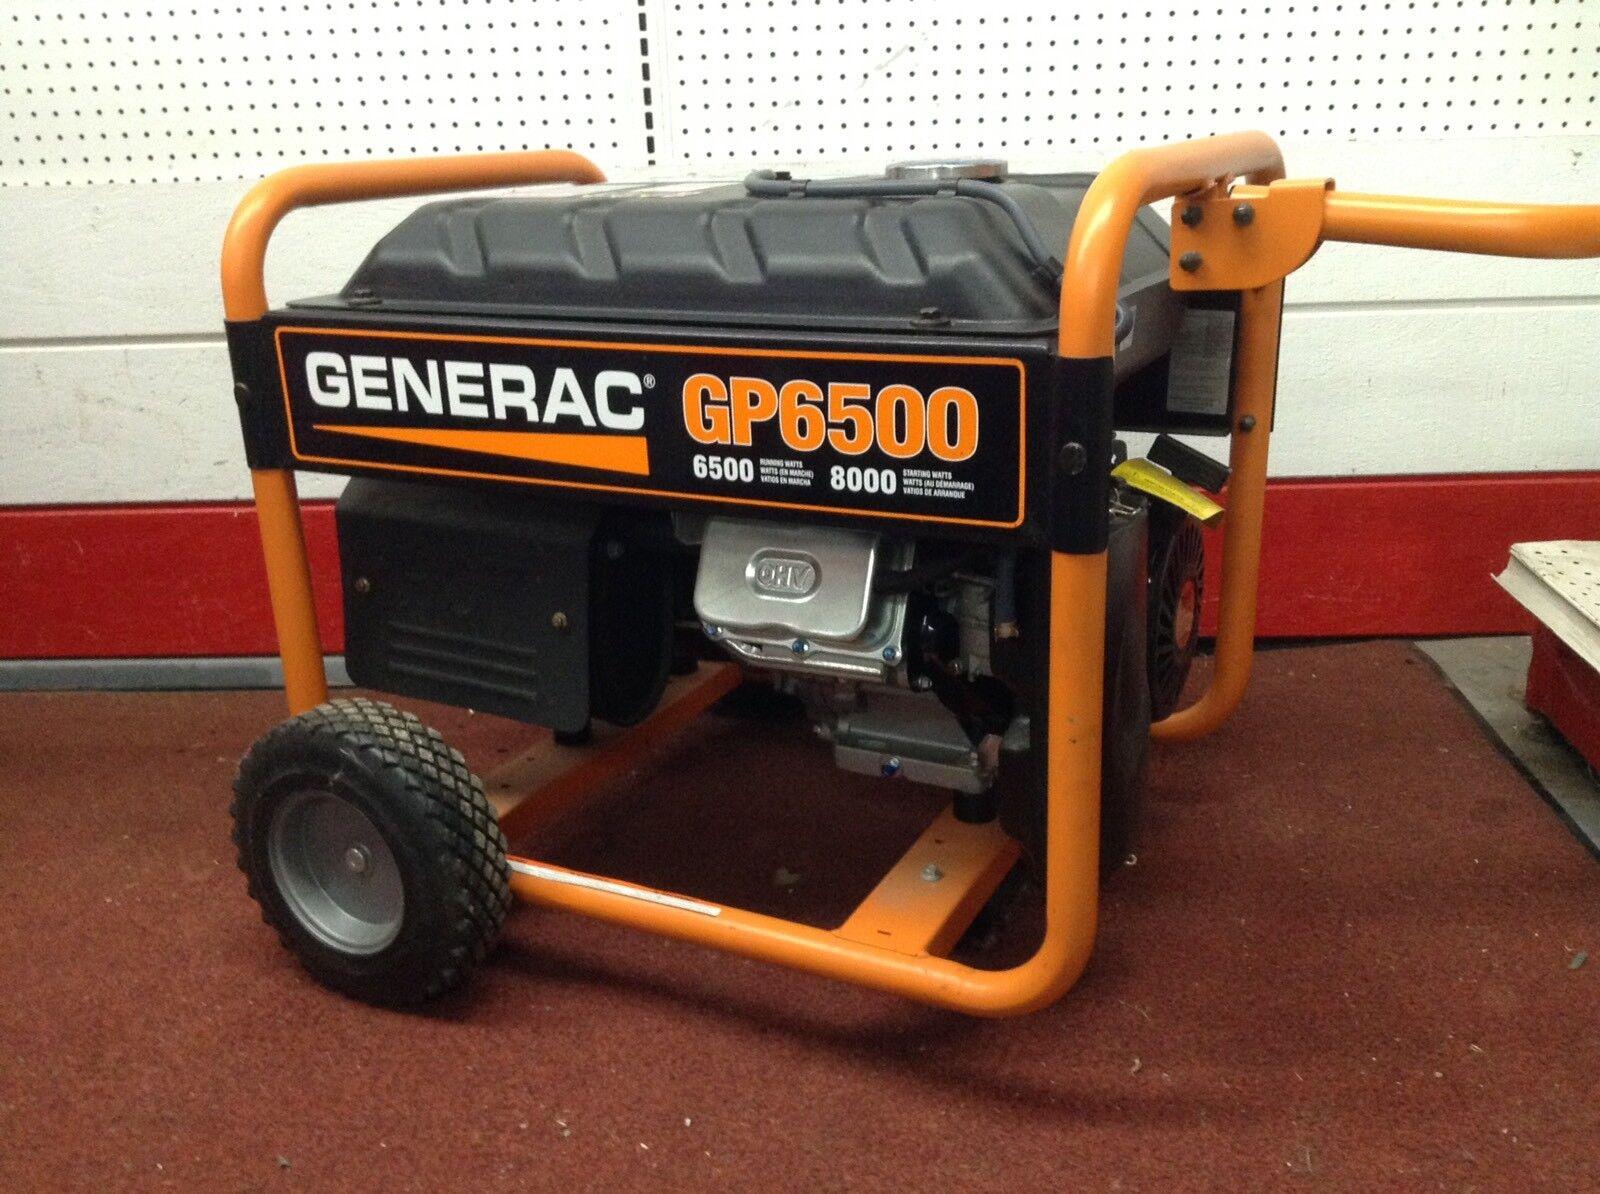 Generac GP6500 GP Series 6,500 Watt Portable Generator